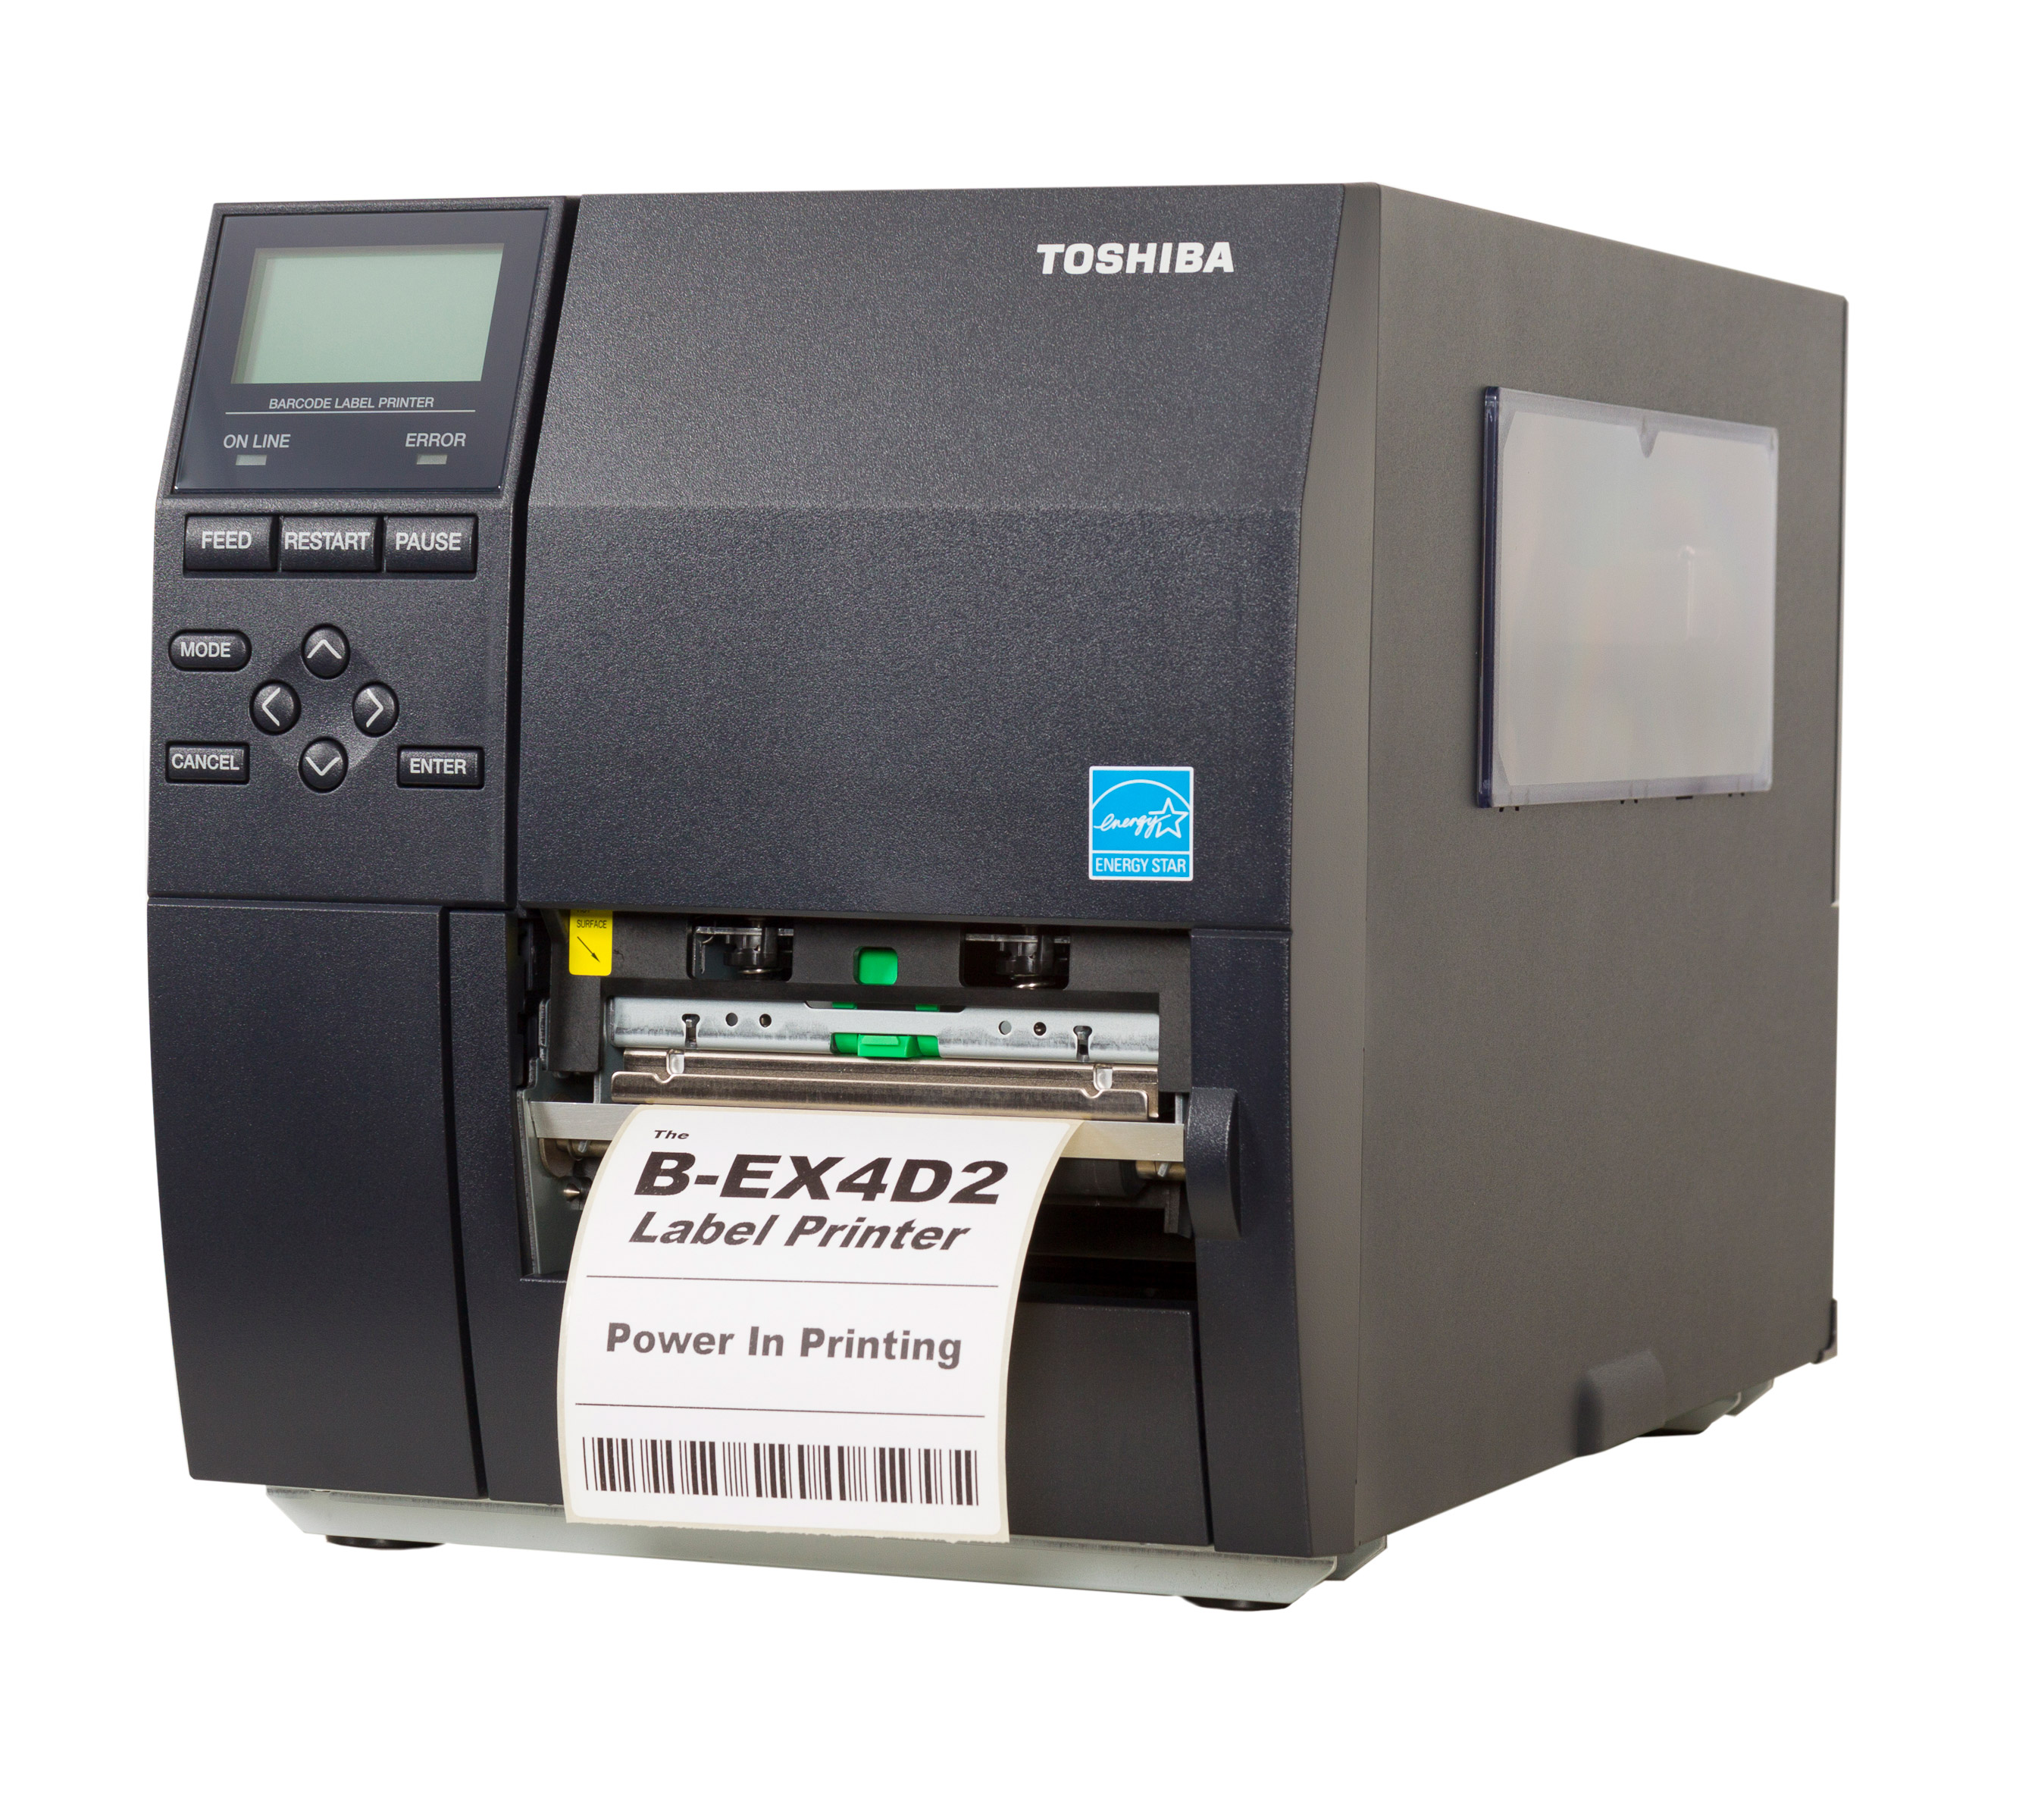 Toshiba B-EX4D2 Etikettendrucker Industrie